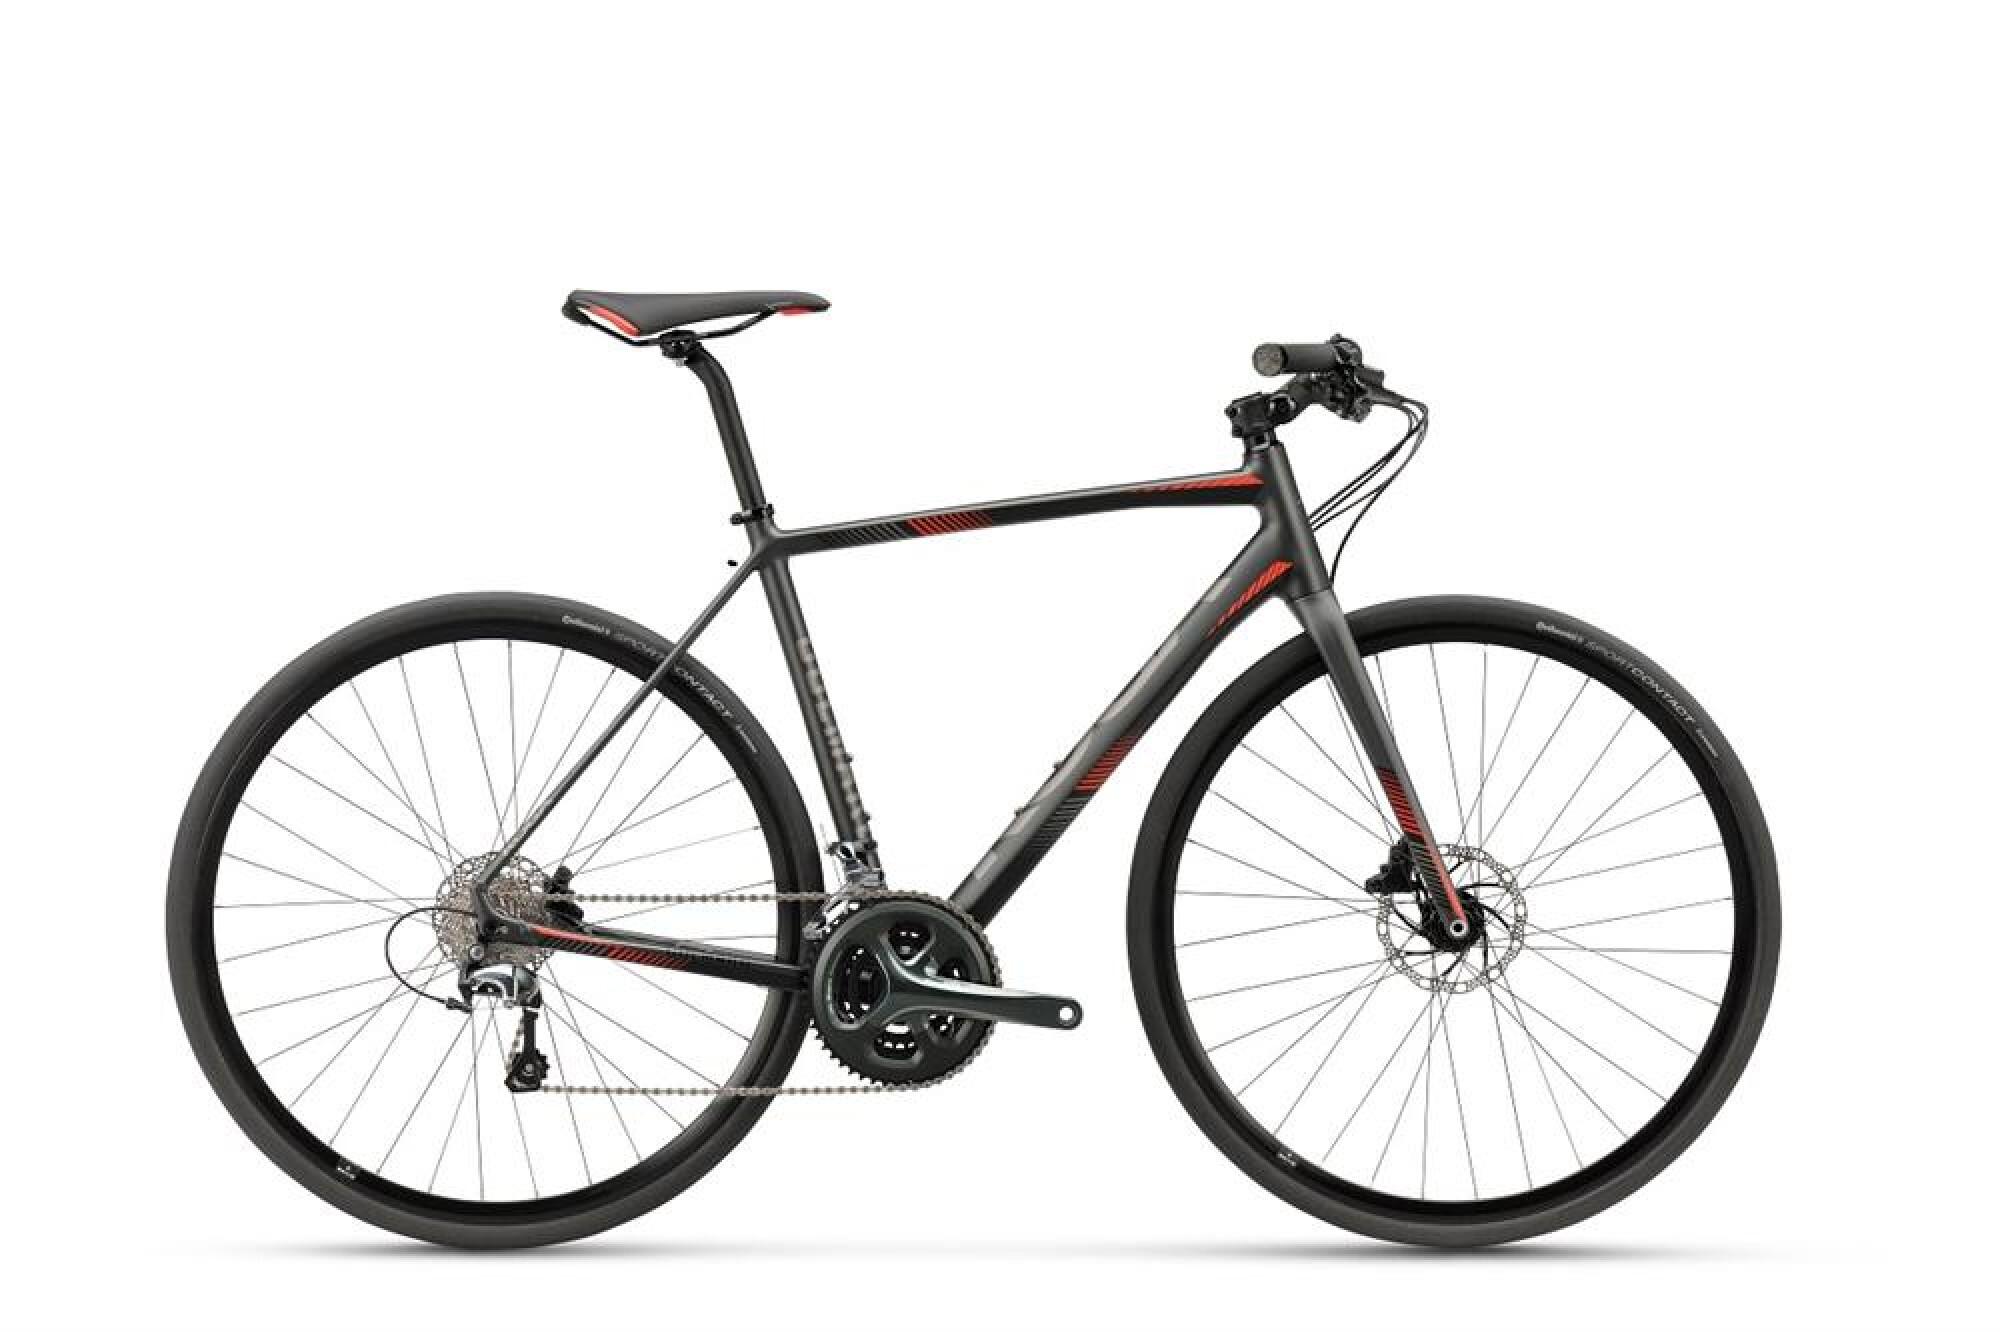 crossbike koga colmaro sports herren 2018 bei. Black Bedroom Furniture Sets. Home Design Ideas